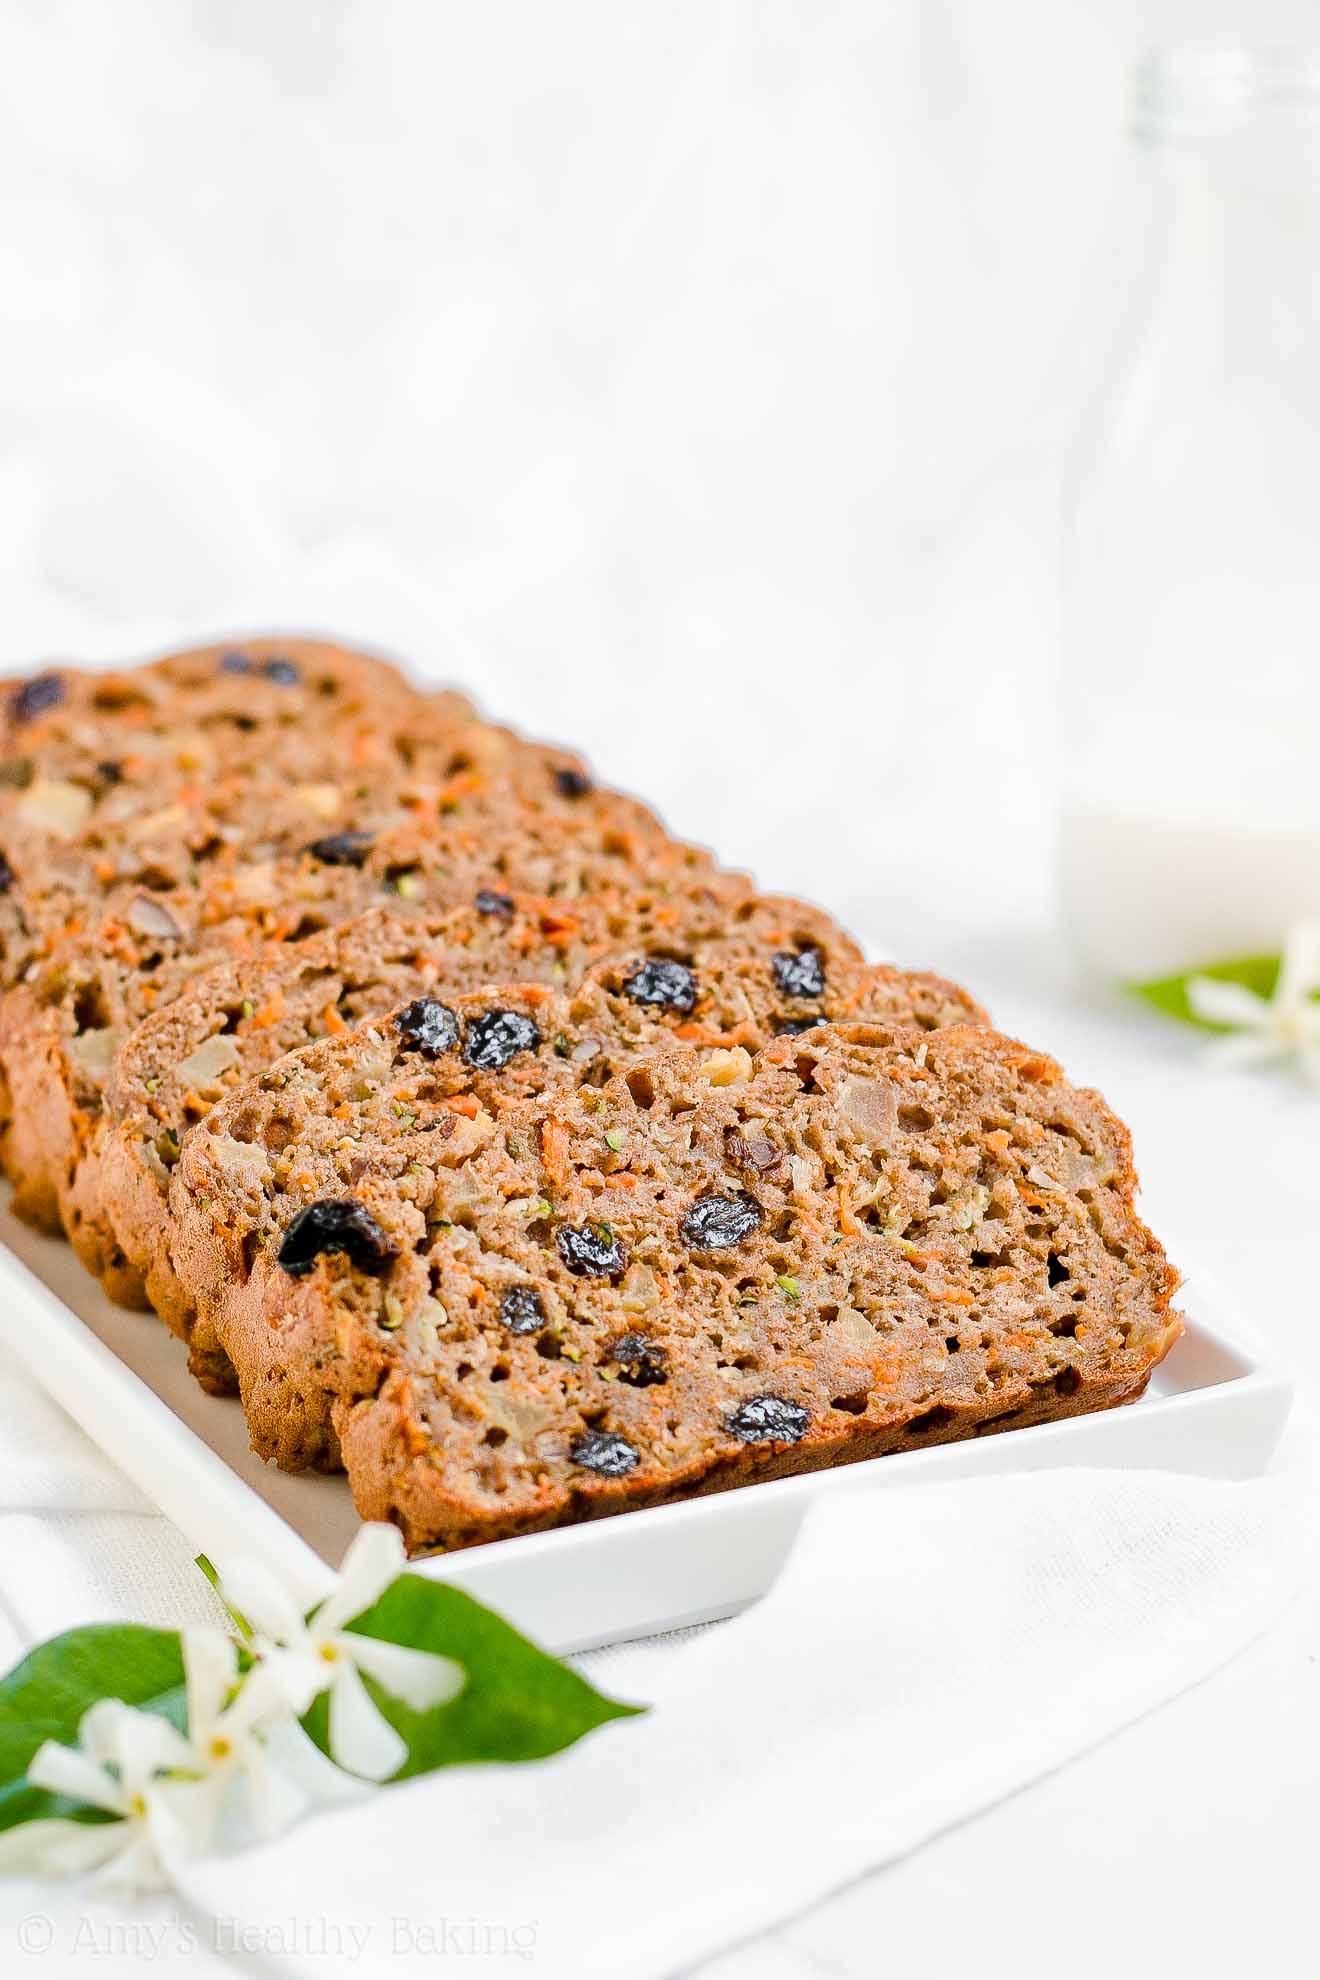 Healthy Gluten Free Morning Glory Zucchini Bread